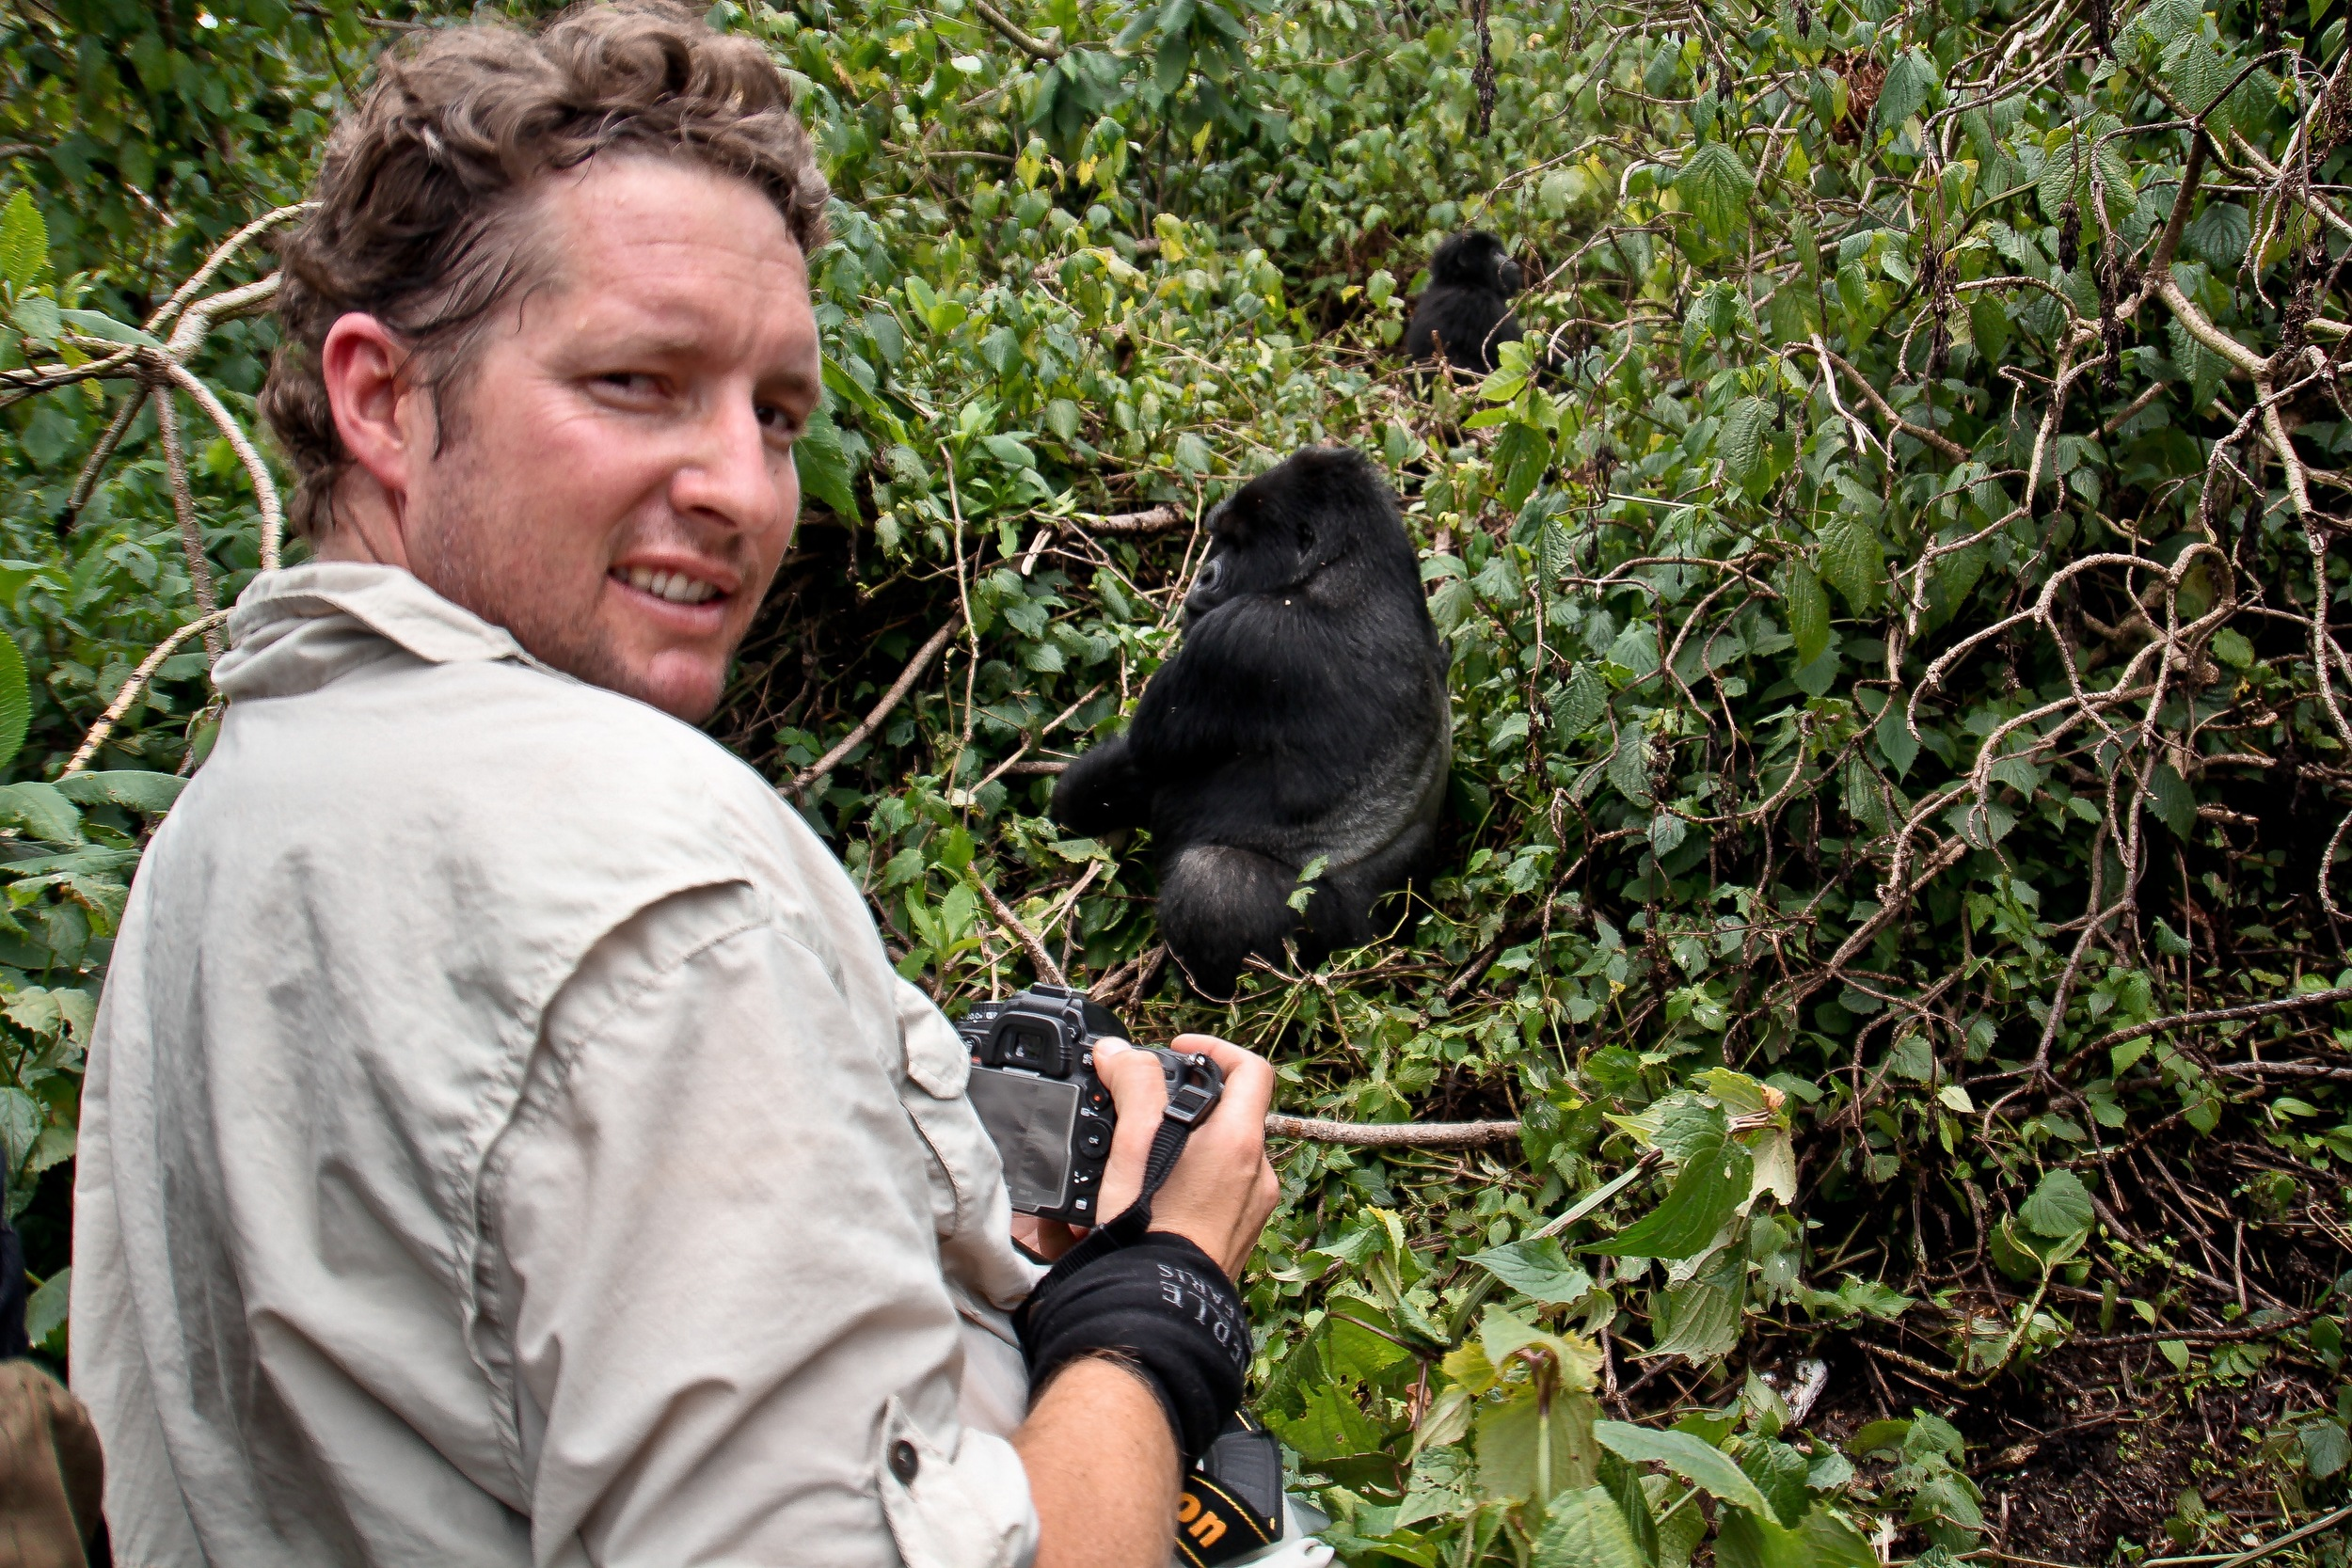 All photos courtesy of Lederle Safaris and Singita